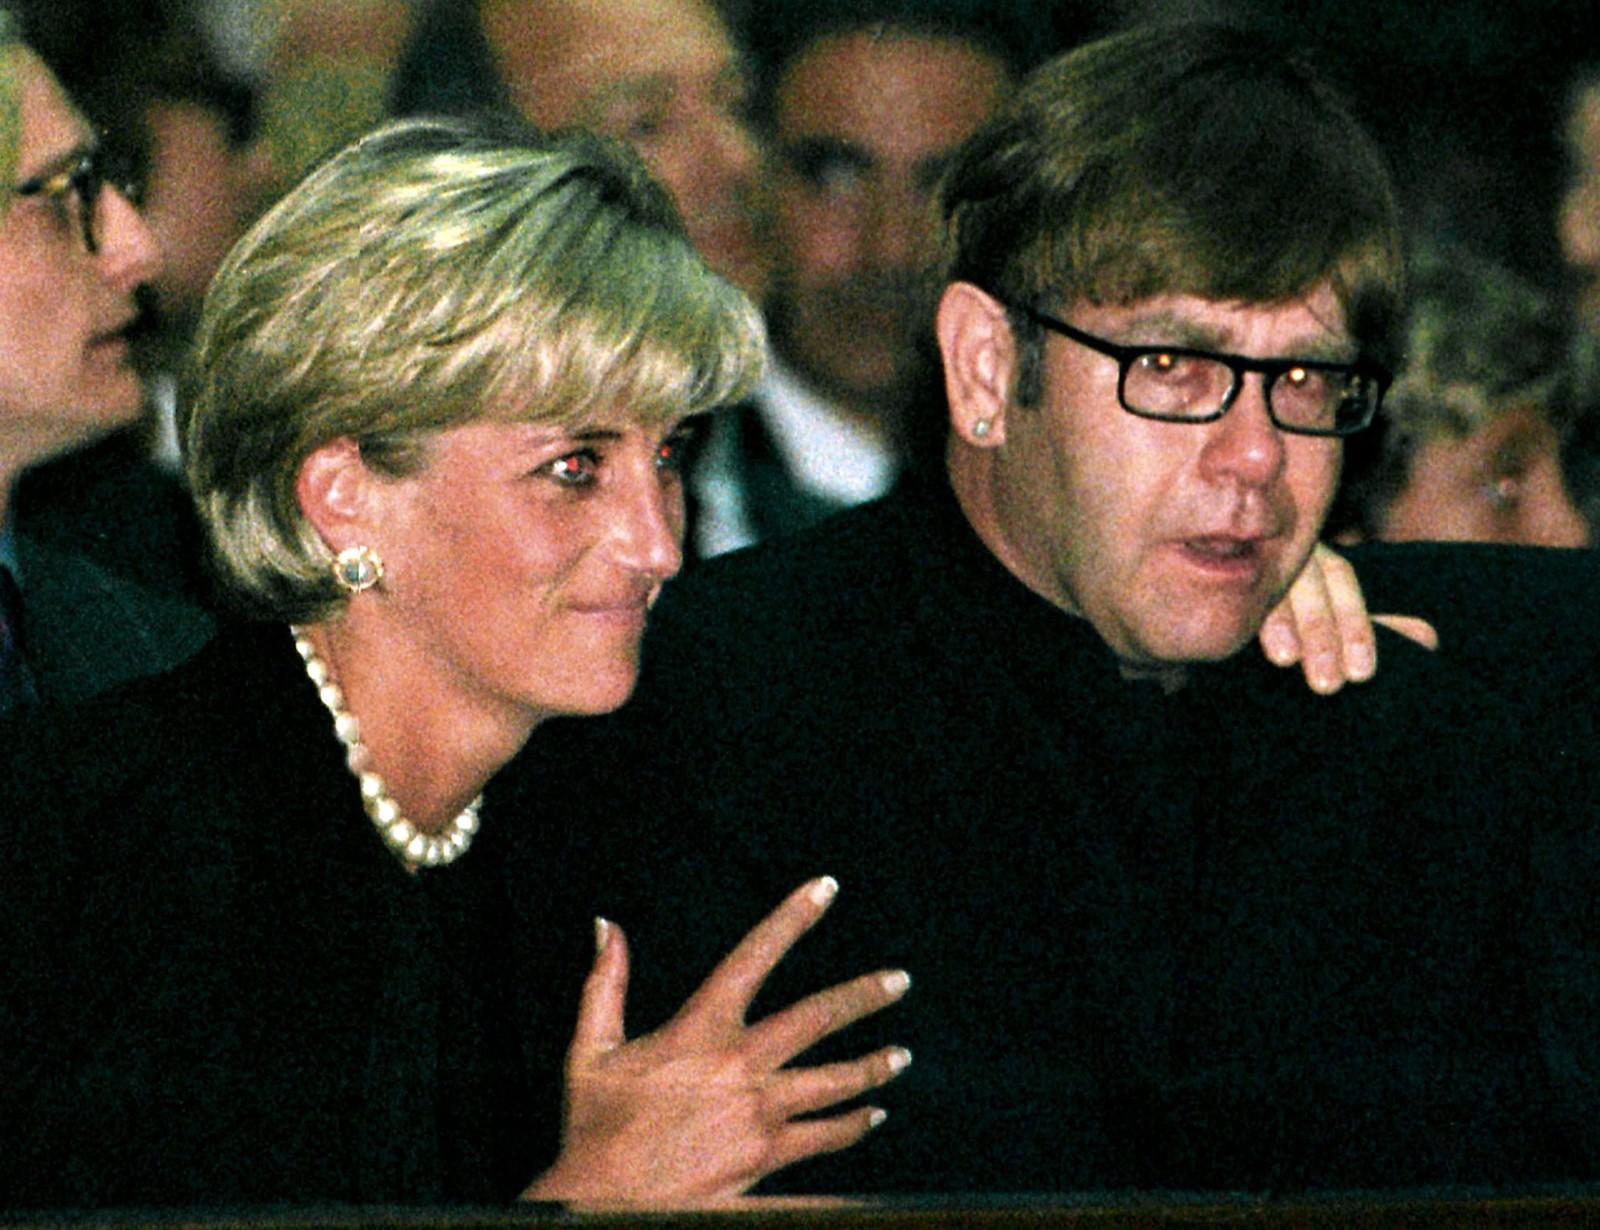 1997: Prinsesse Diana trøystar ein gråtande Elton John under minneseremonien for den italienske moteskaparen Gianni Versace i katedralen i Milano 22. juli.